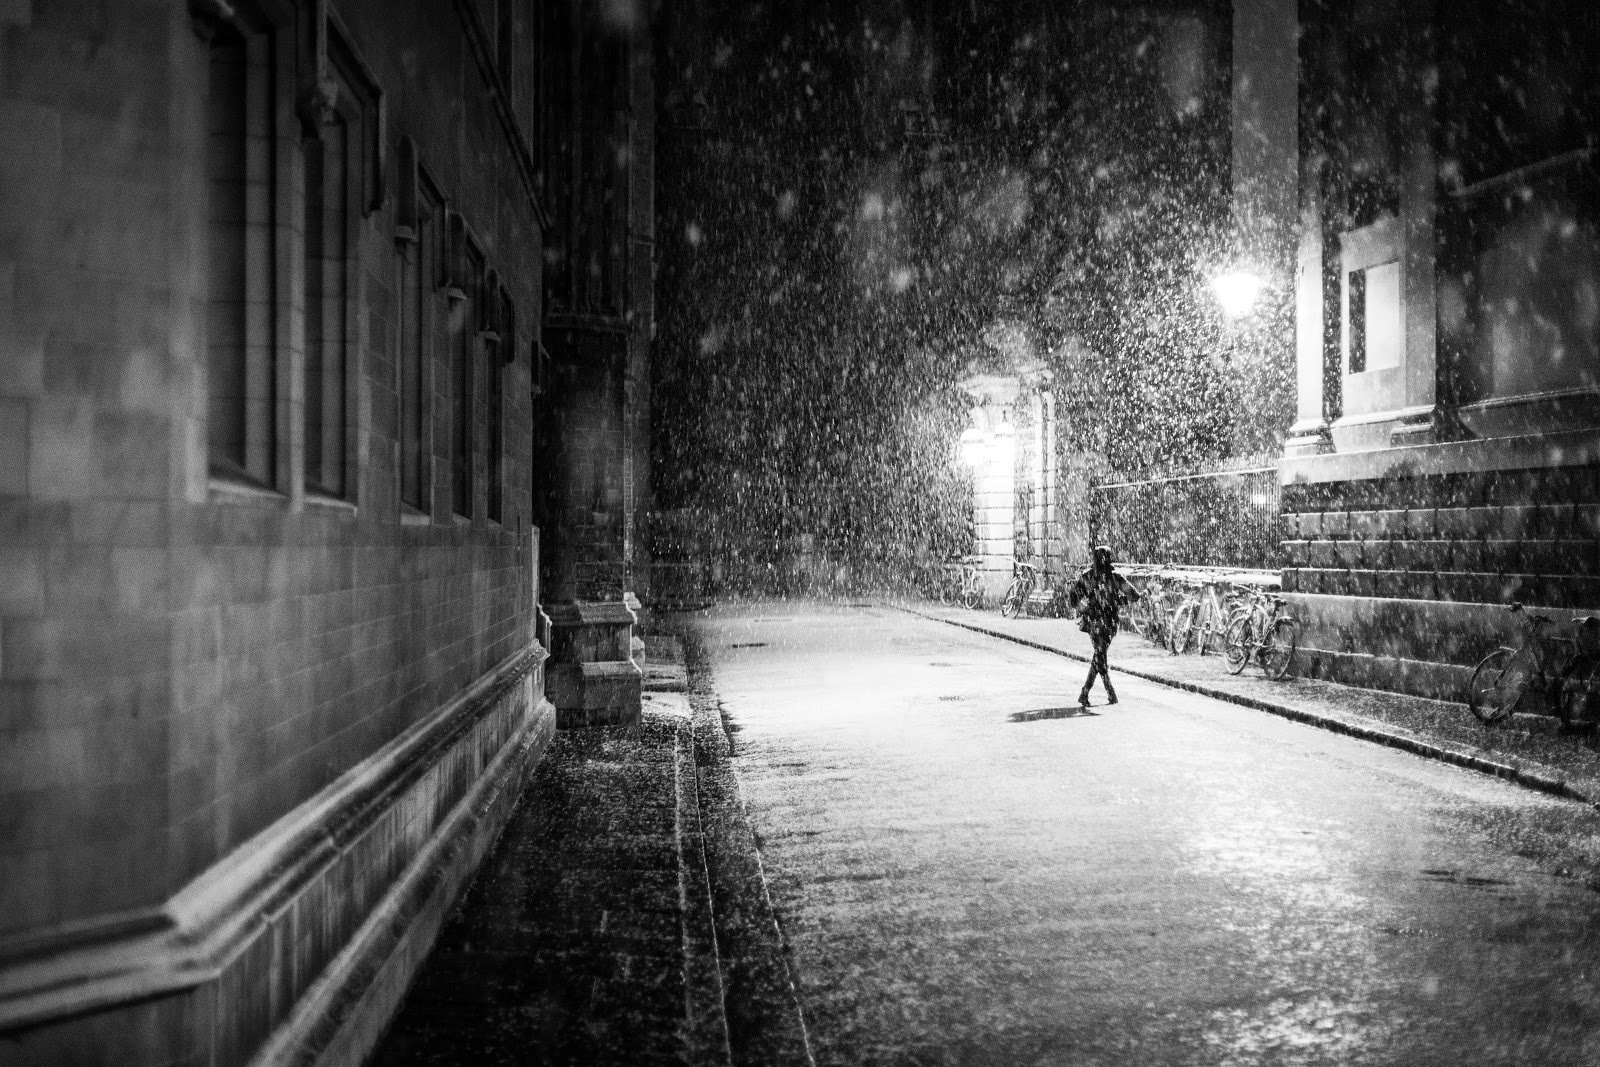 Person running through a downpour by Dominik Schröder